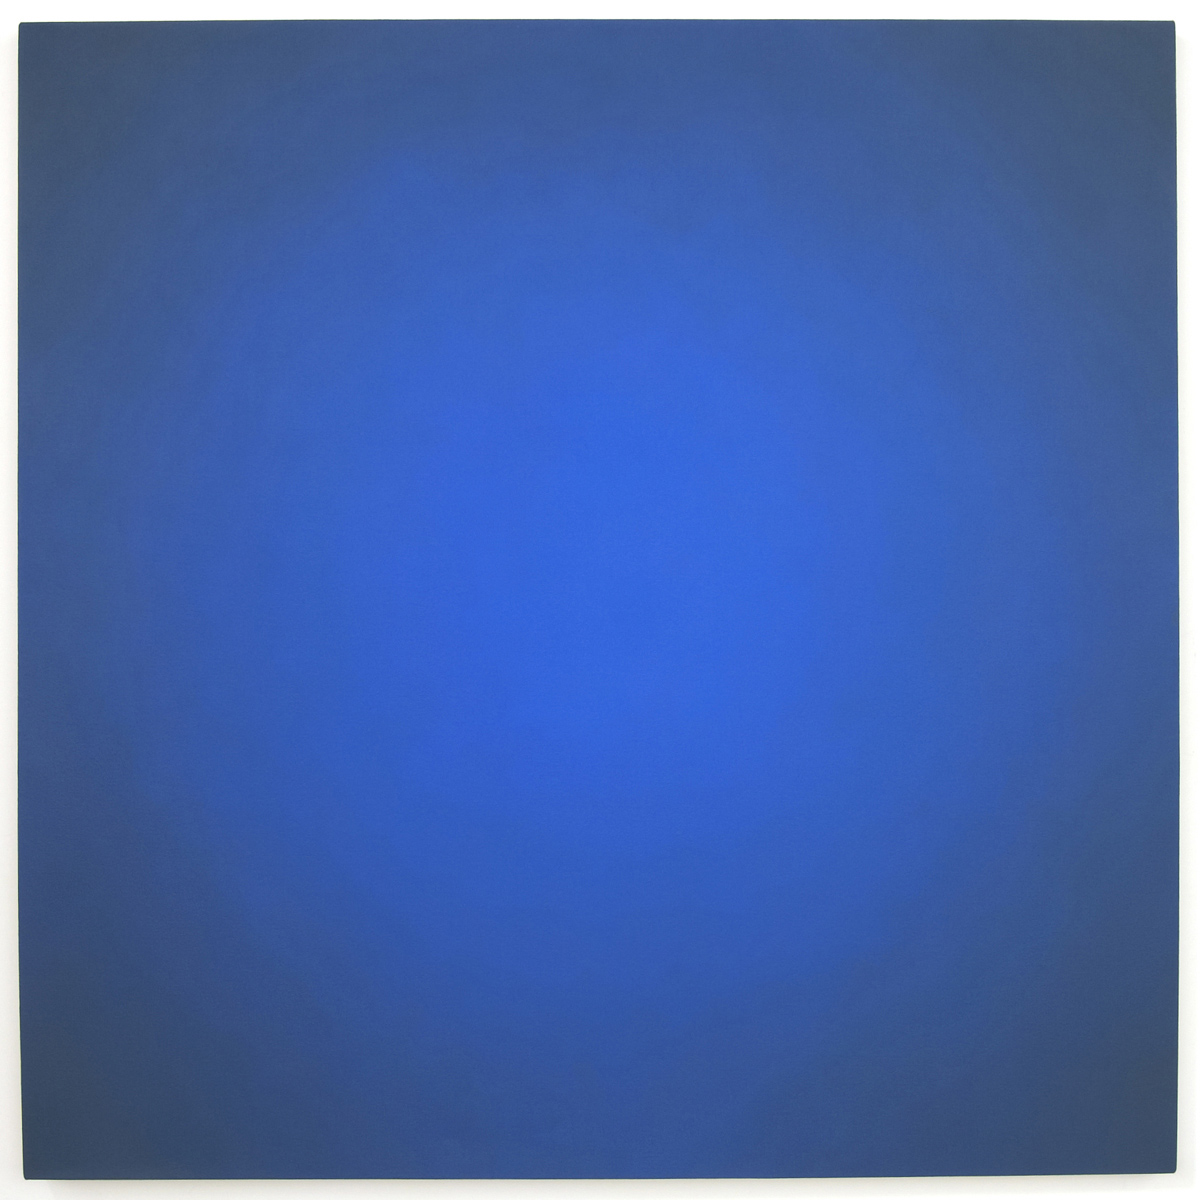 Blue Orange #3 (Red-Orange), Equivalence Blue Orange Series, 2005, oil on canvas, 48 x 48 in. (122 x 122 cm.)